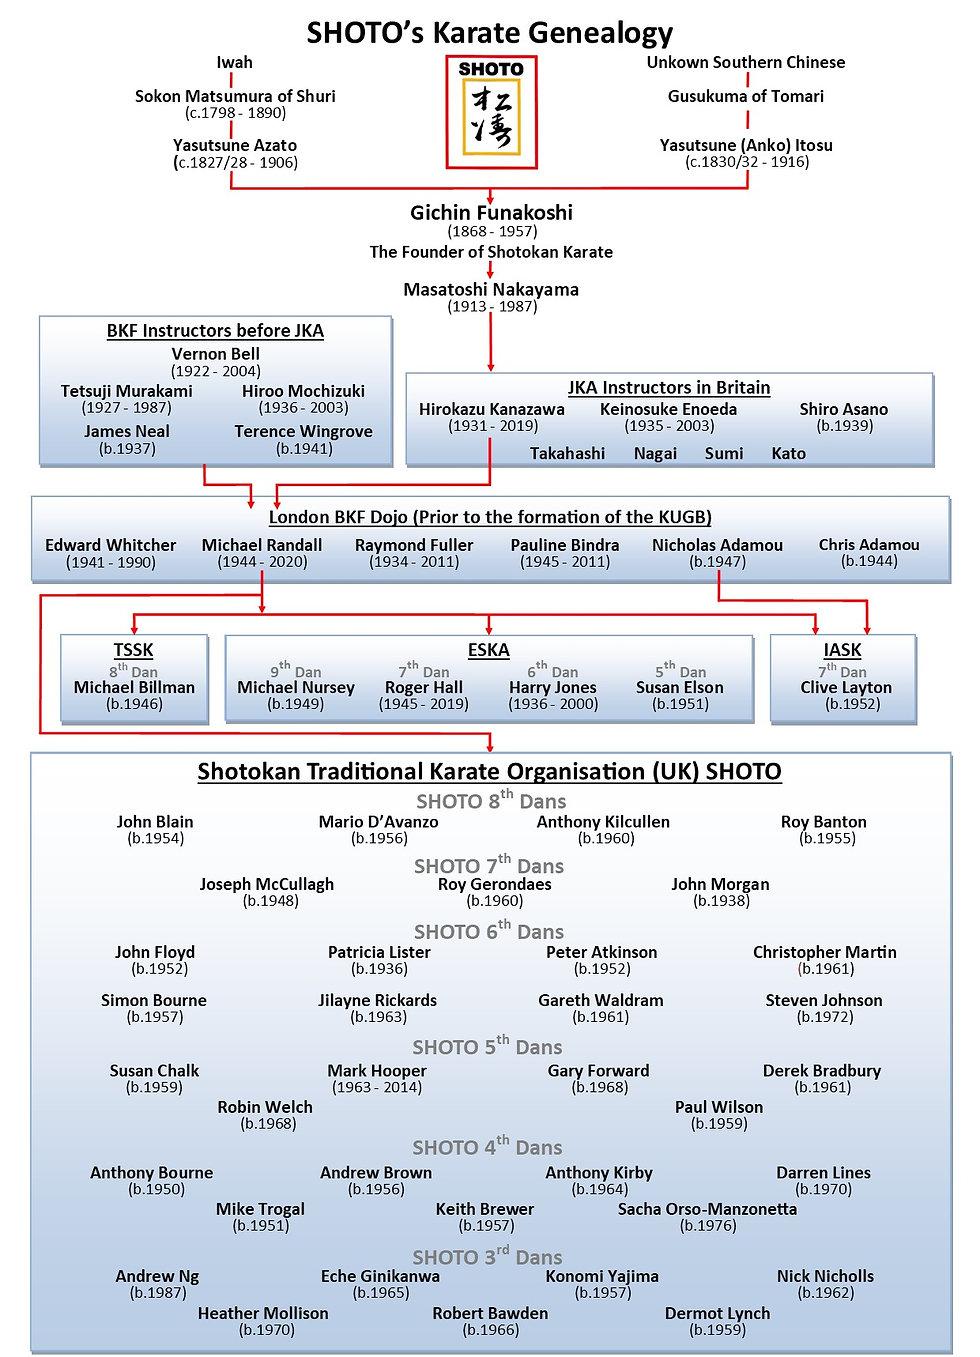 Shoto Geneology August 2020.jpg